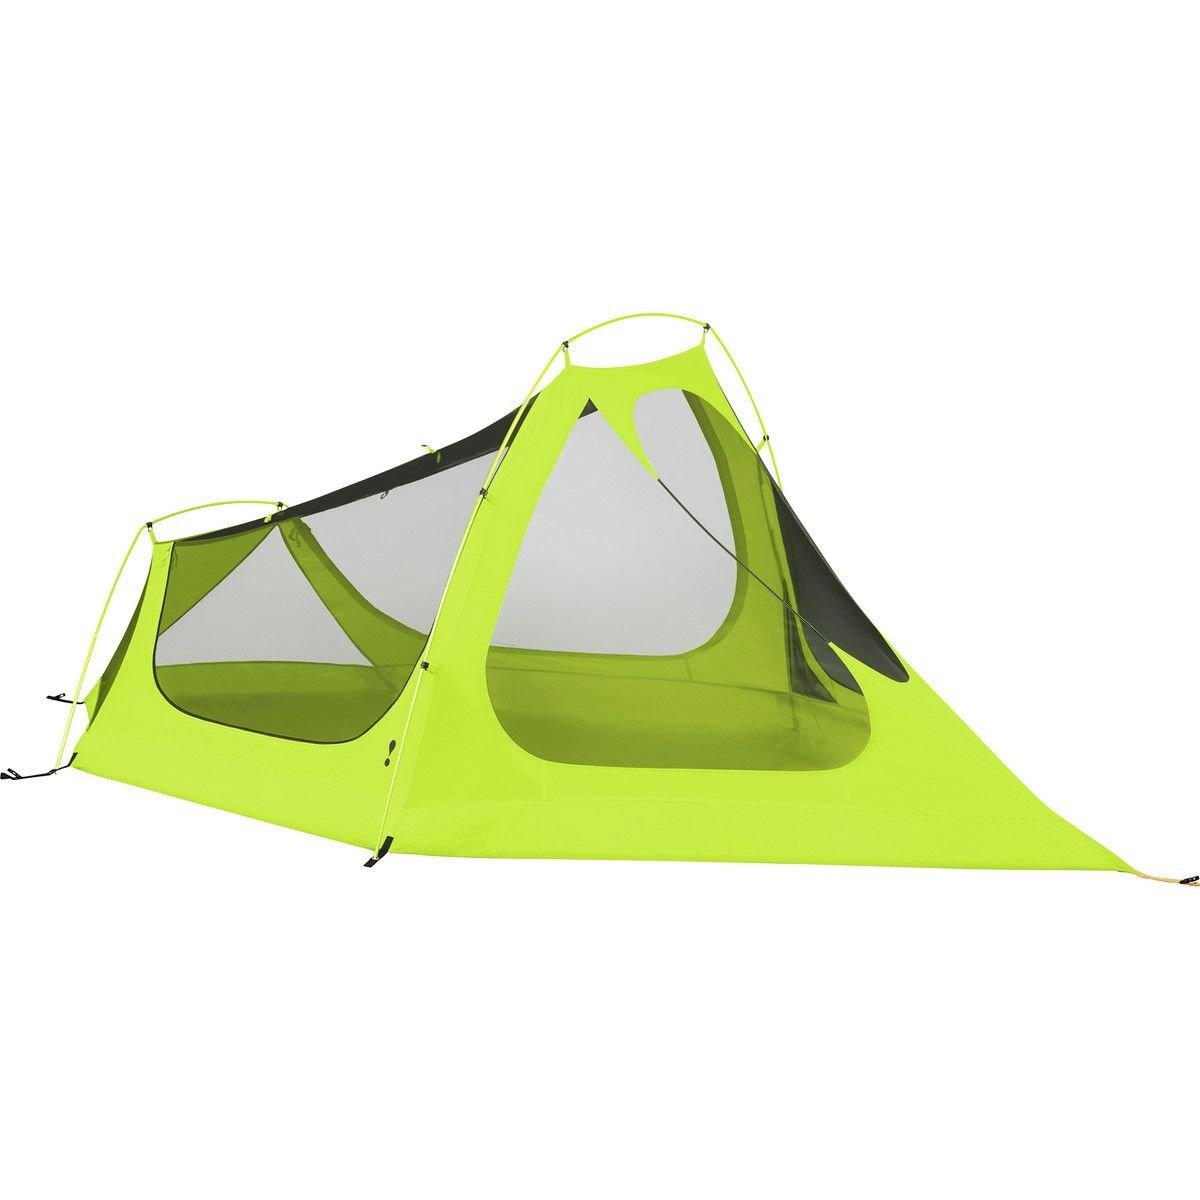 sc 1 st  Amazon.com & Amazon.com : Eureka Spitfire 2 Tent : Sports u0026 Outdoors